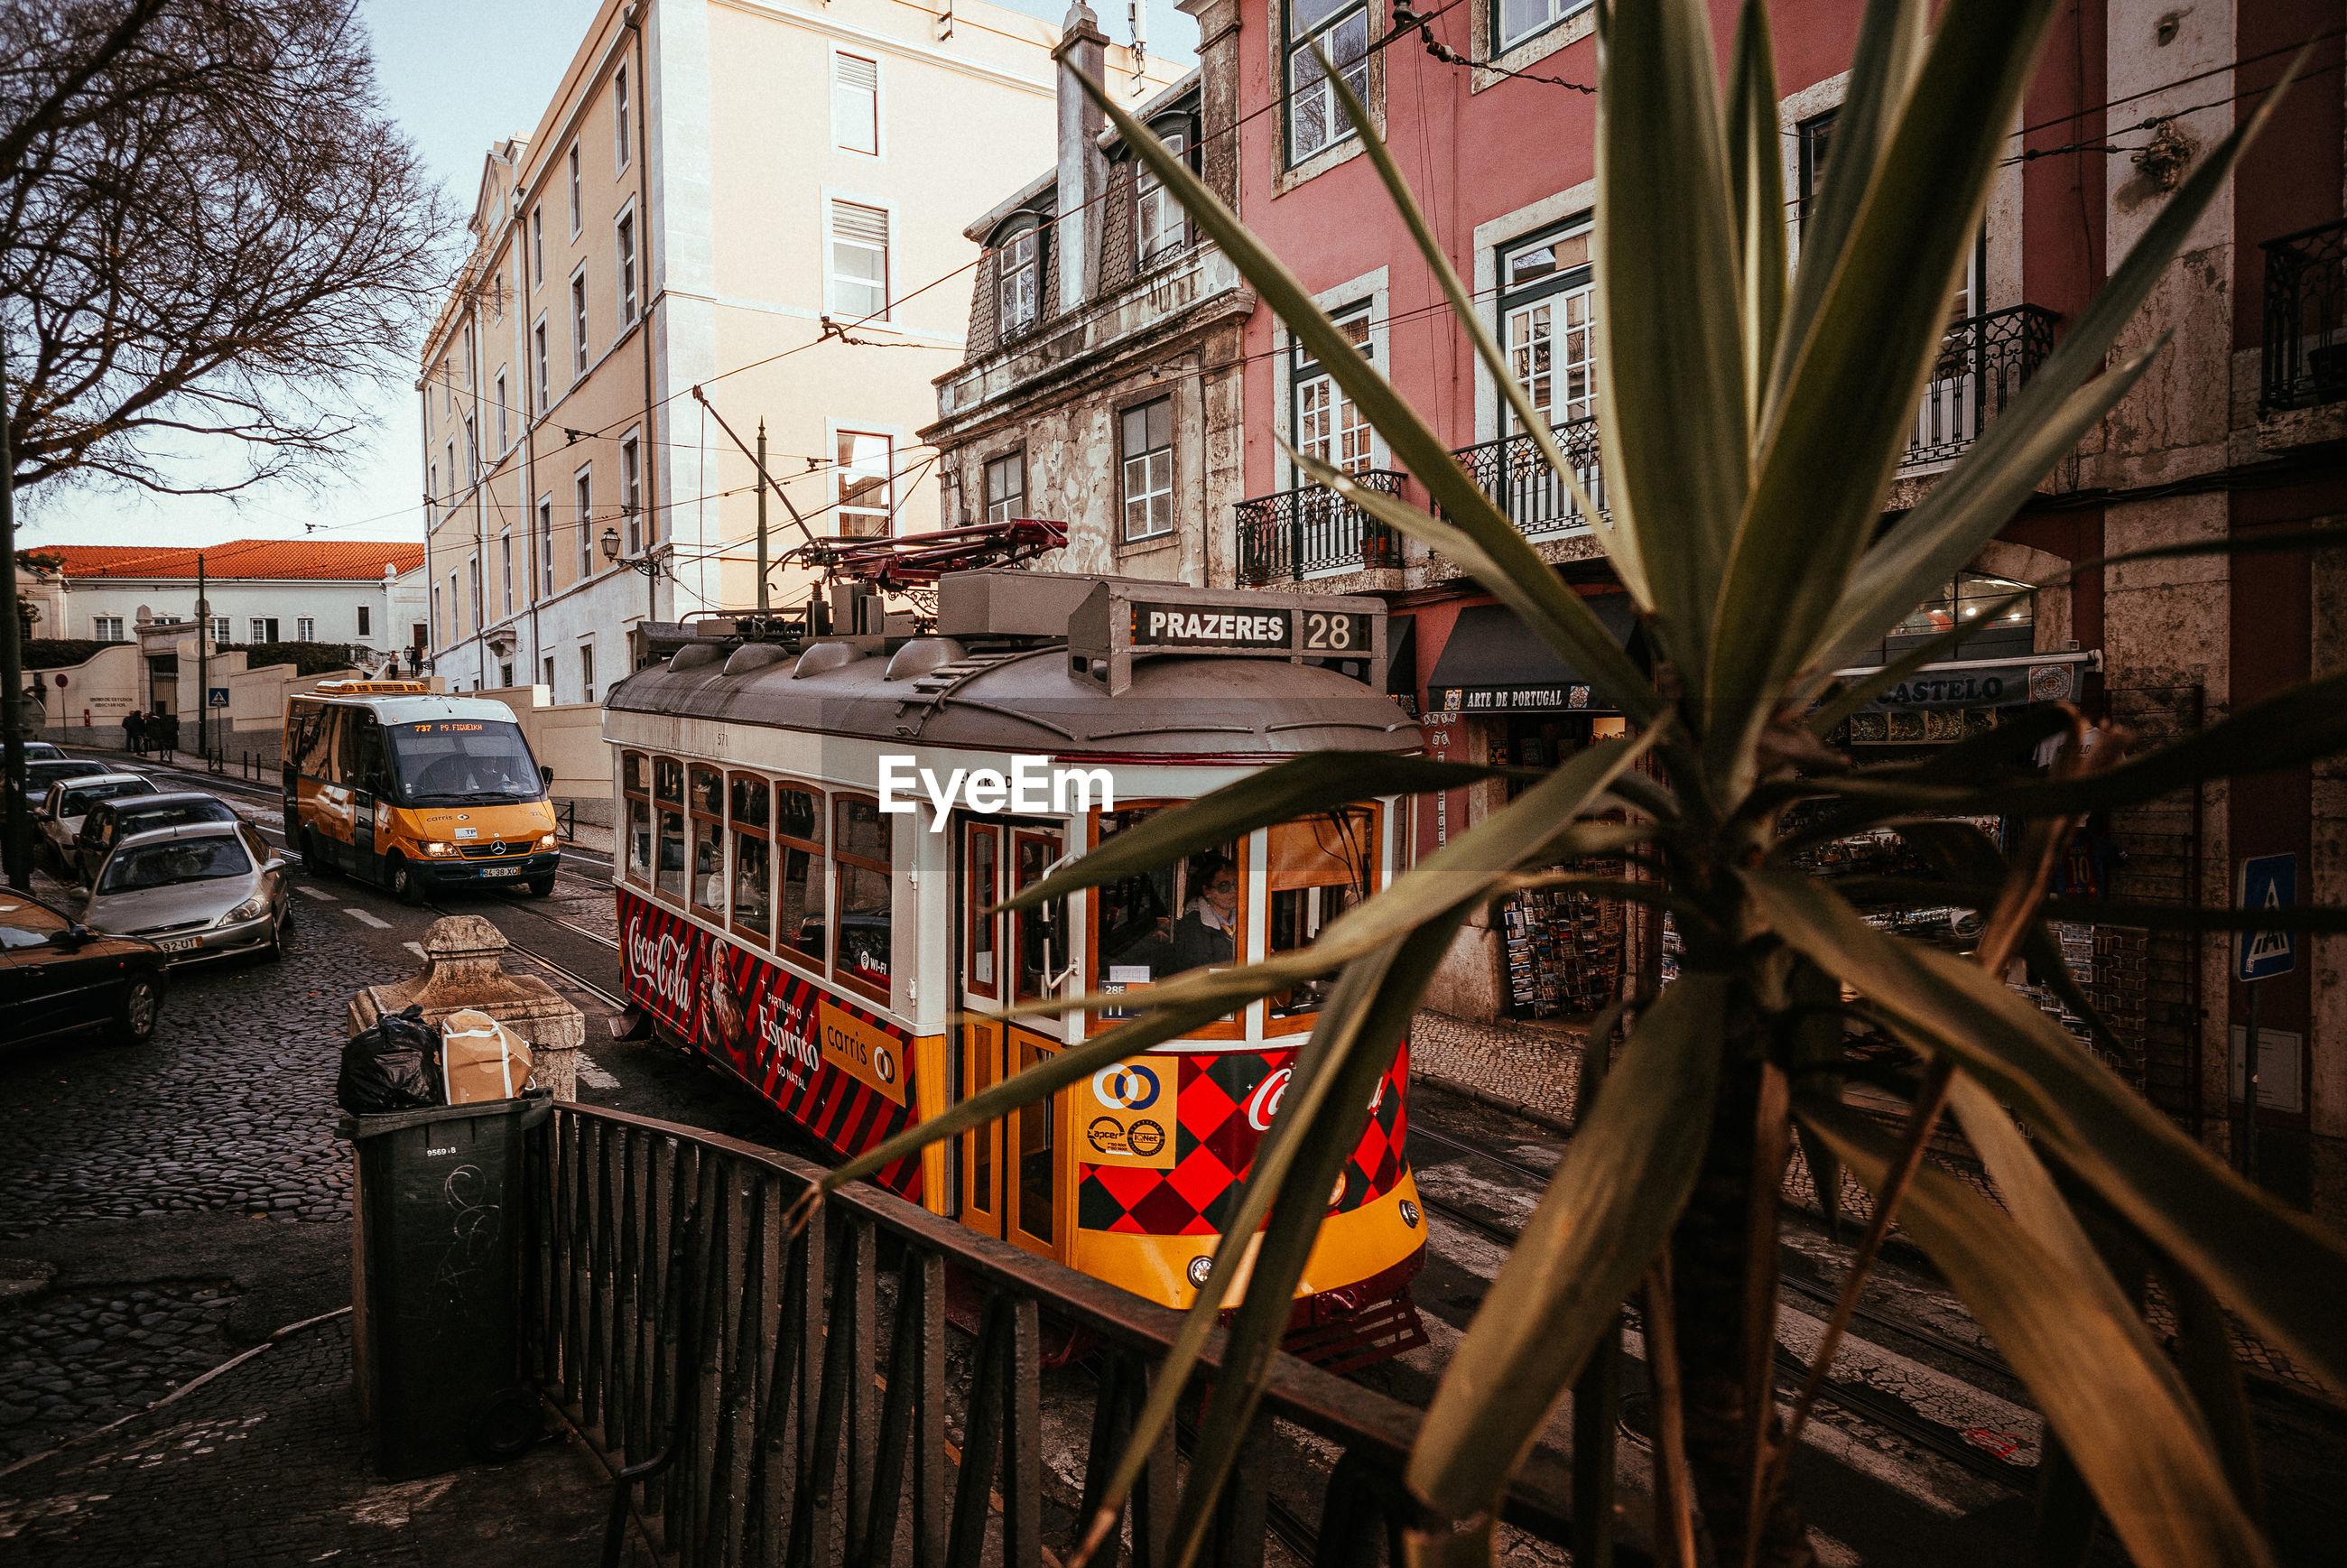 STREET BY BUILDINGS IN CITY